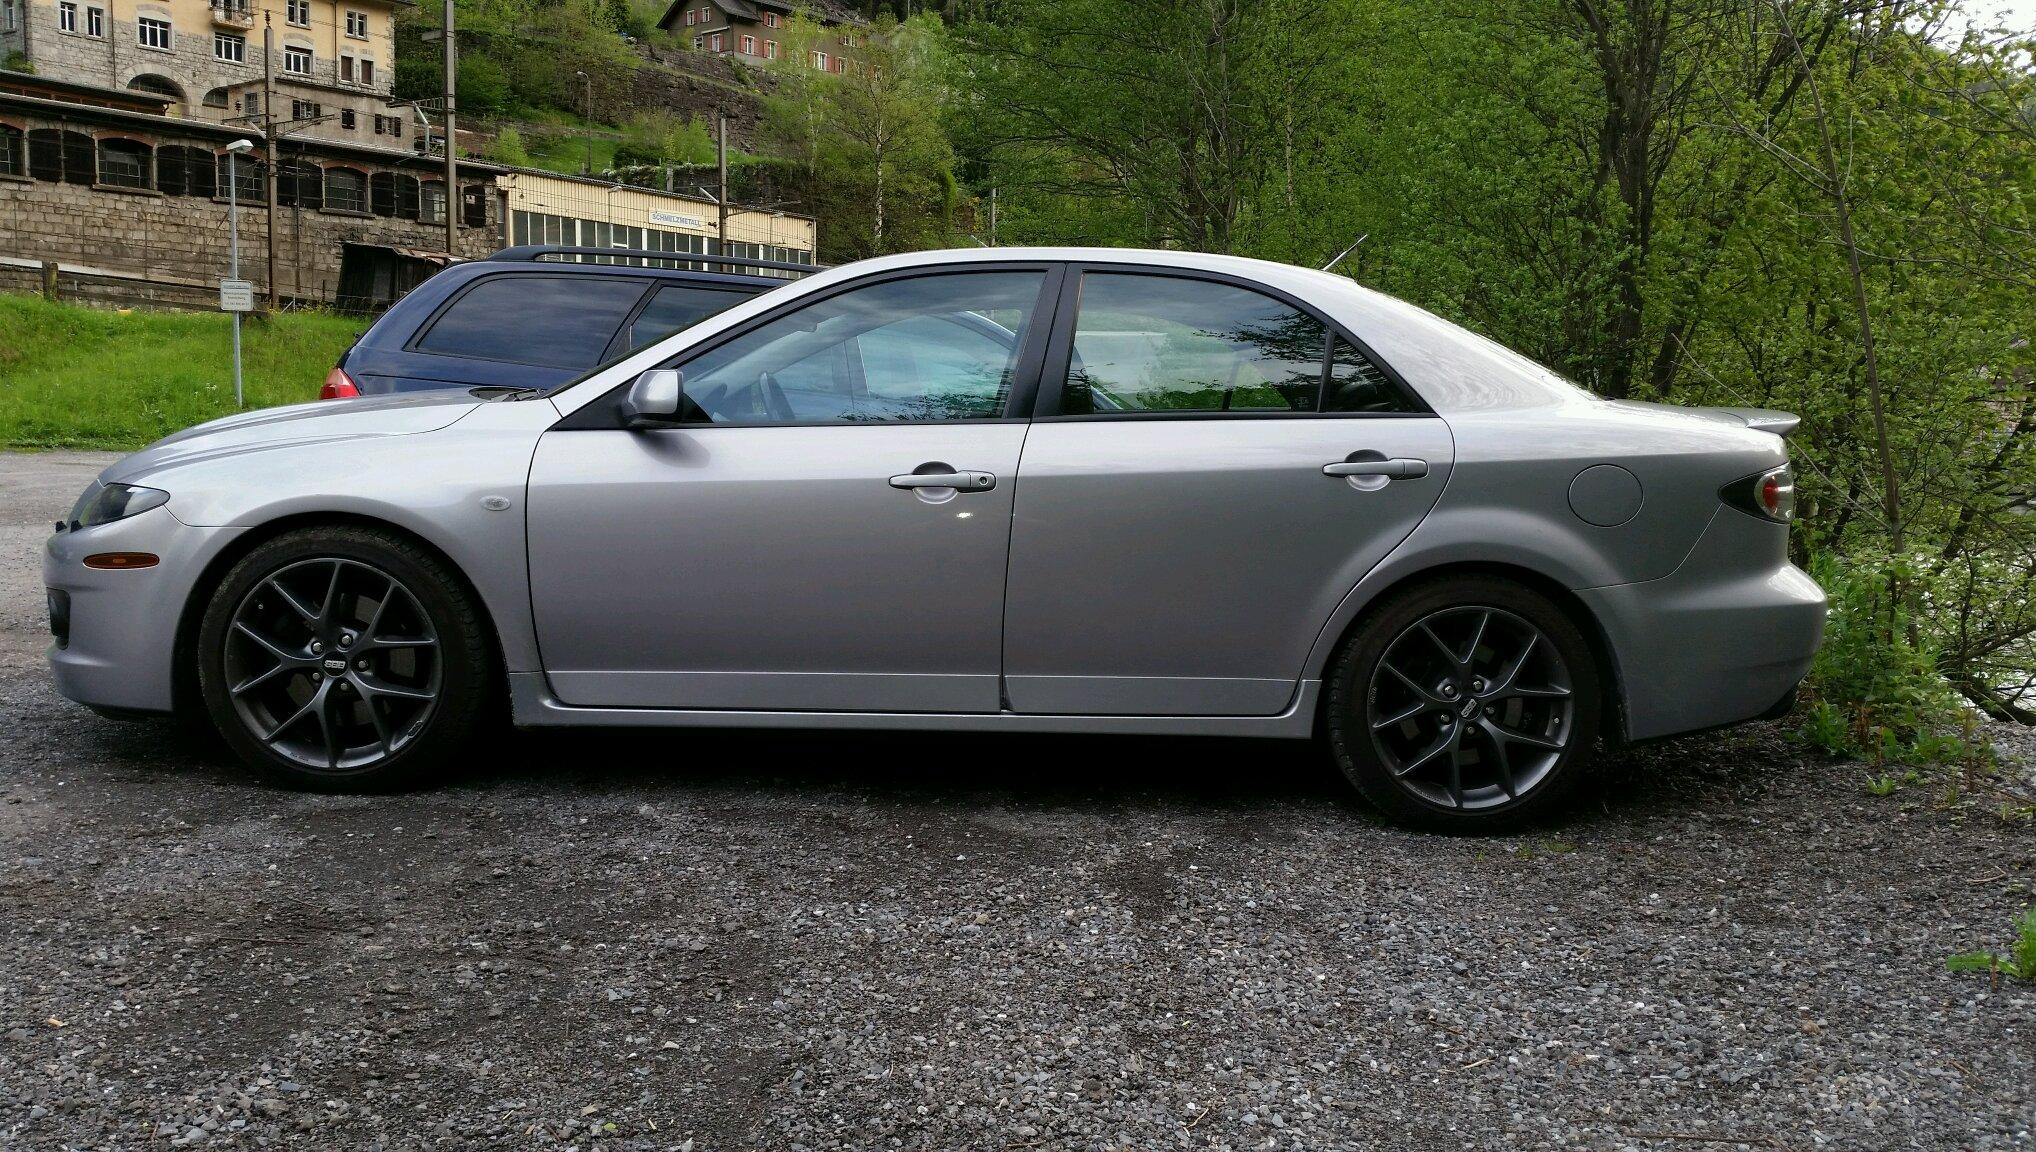 2007 Mazda 6 mps